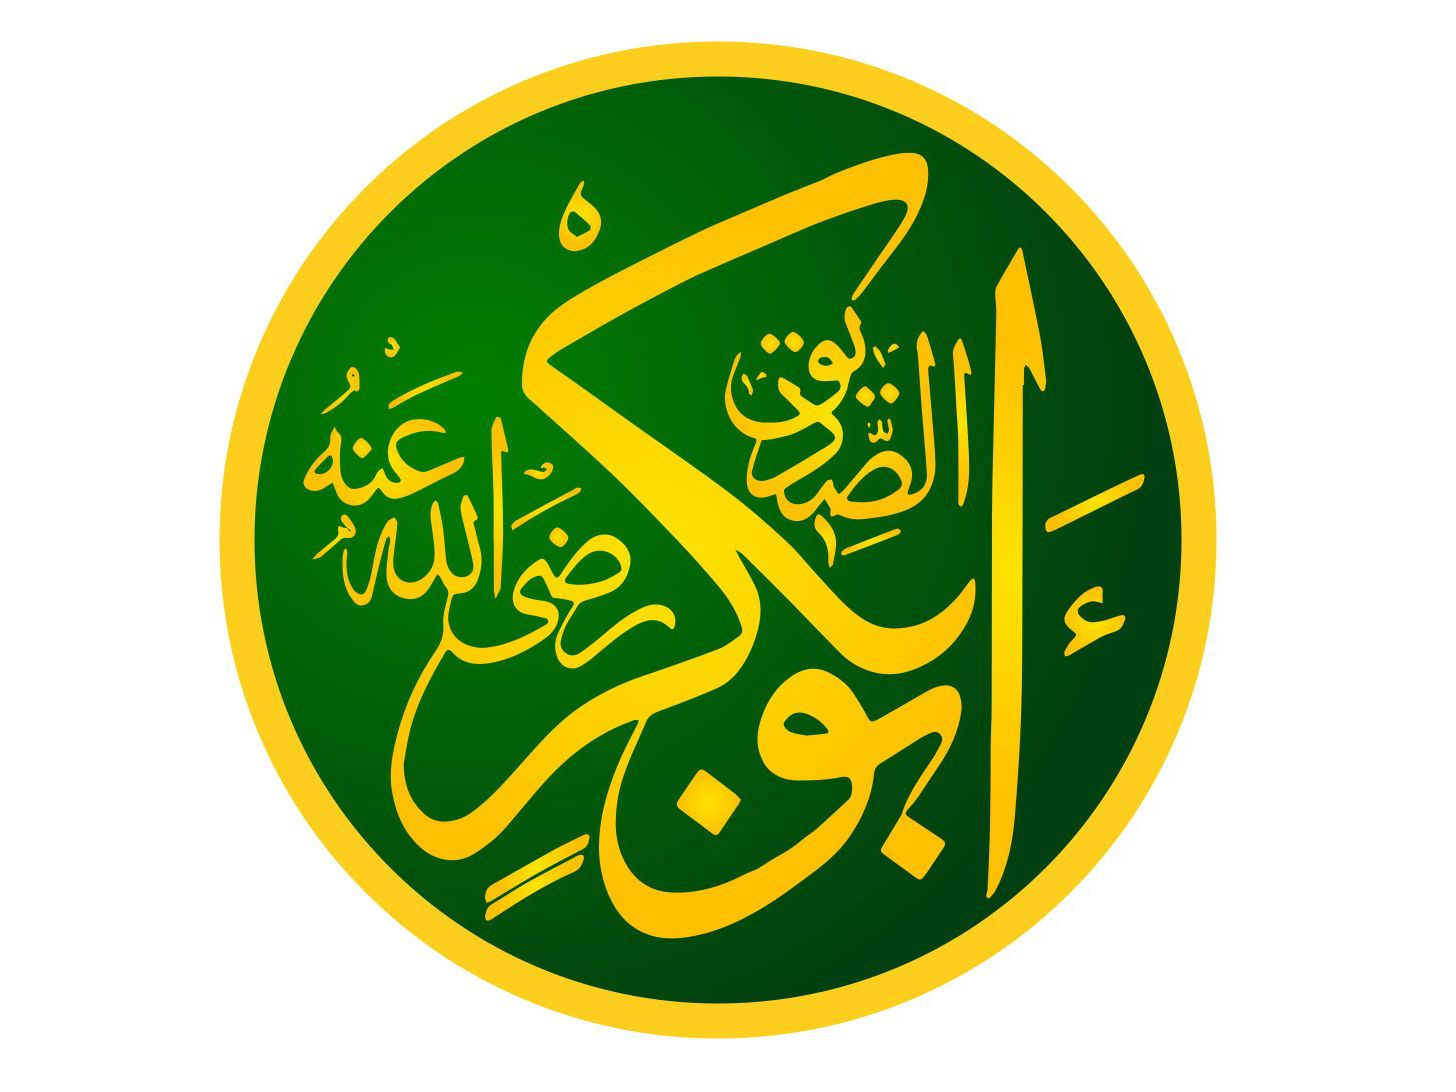 Abu Bakr - the First Muslim Caliph